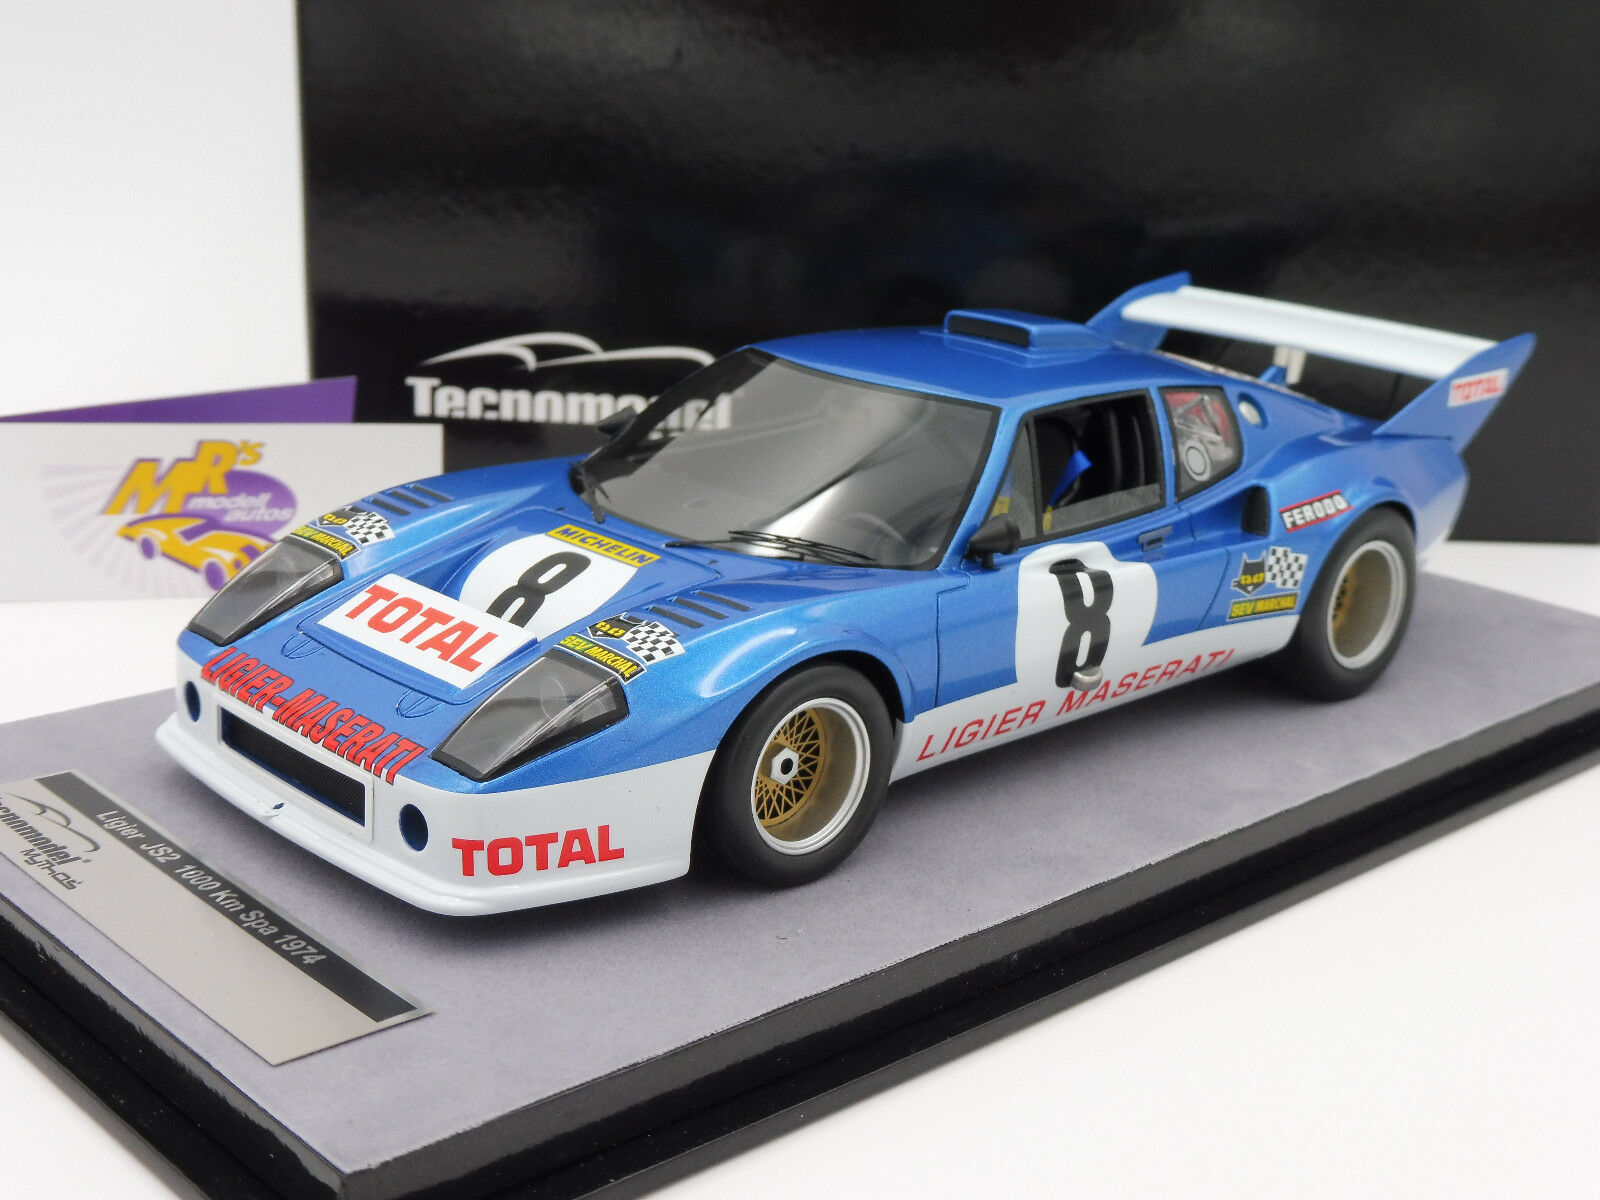 Tecnomodel TM18-99C Ligier JS2 No. 8 1000 KM Spa 1974 Chasseuli - Migault 1 18